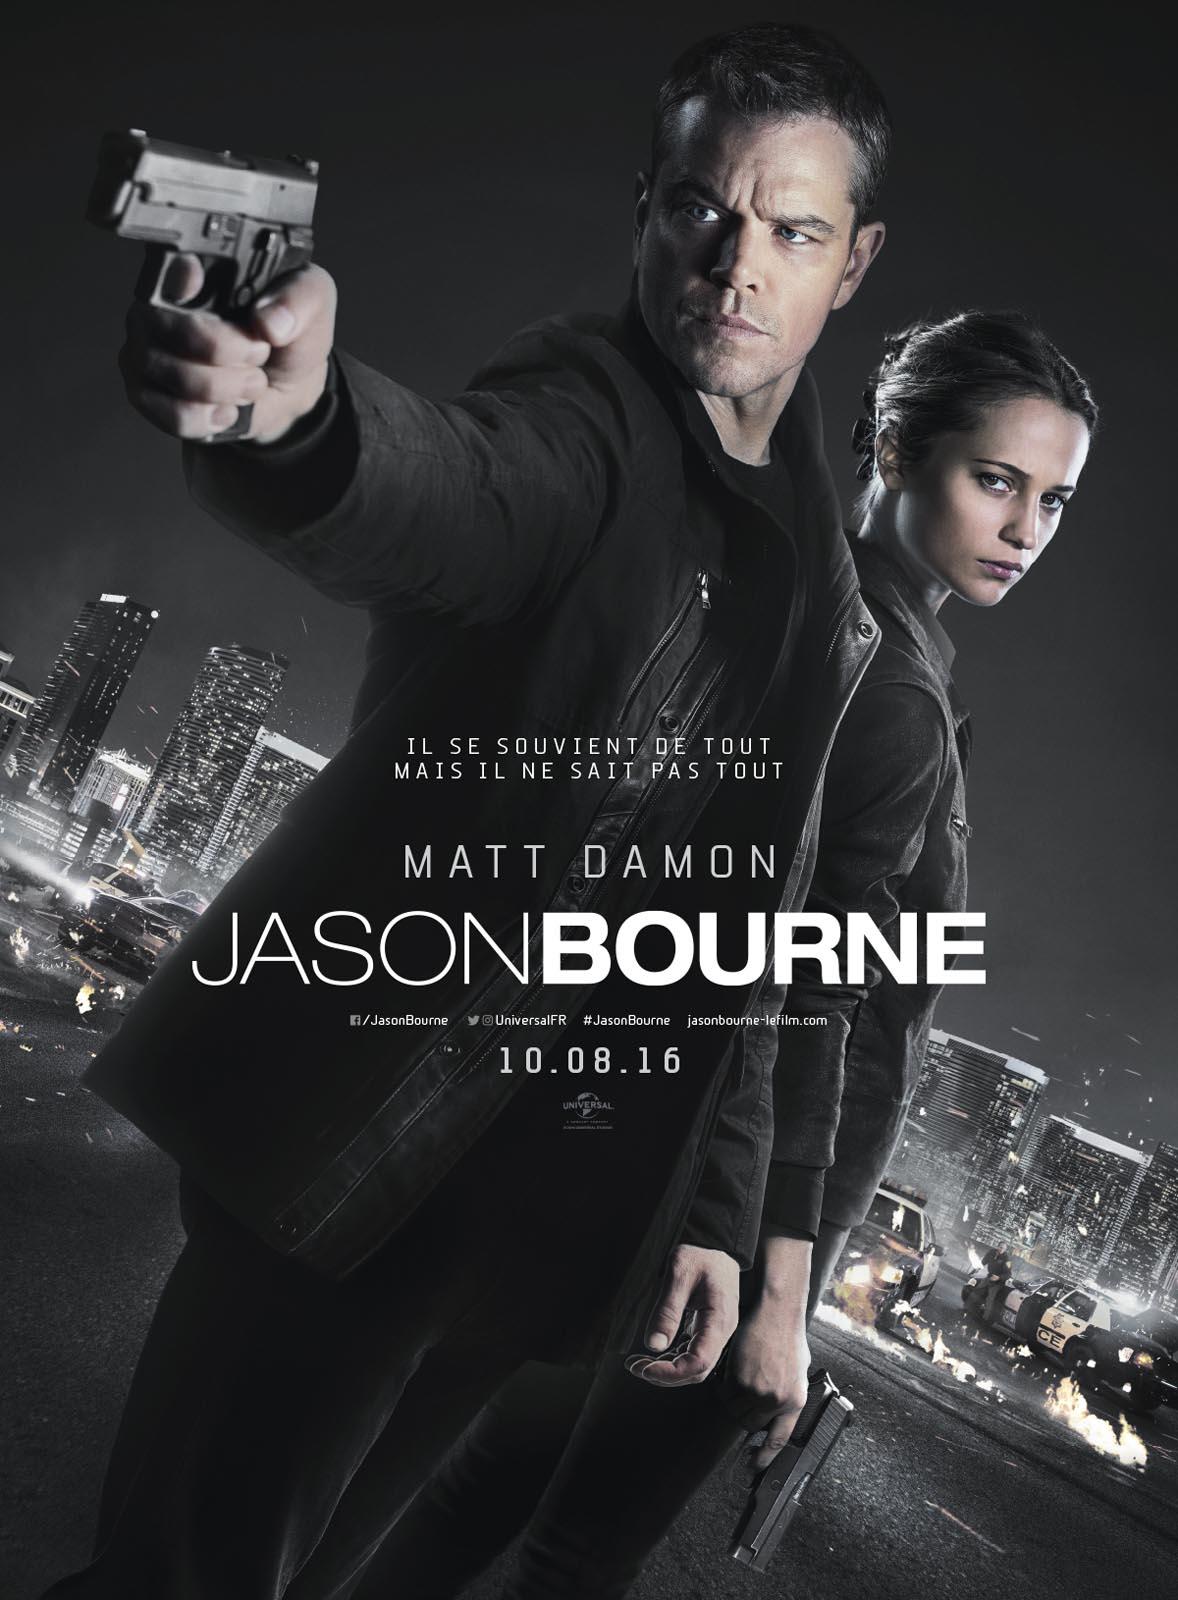 Jason Bourne - 2016 - Matt Damon - Tommy lee Jones -Vincent Cassel